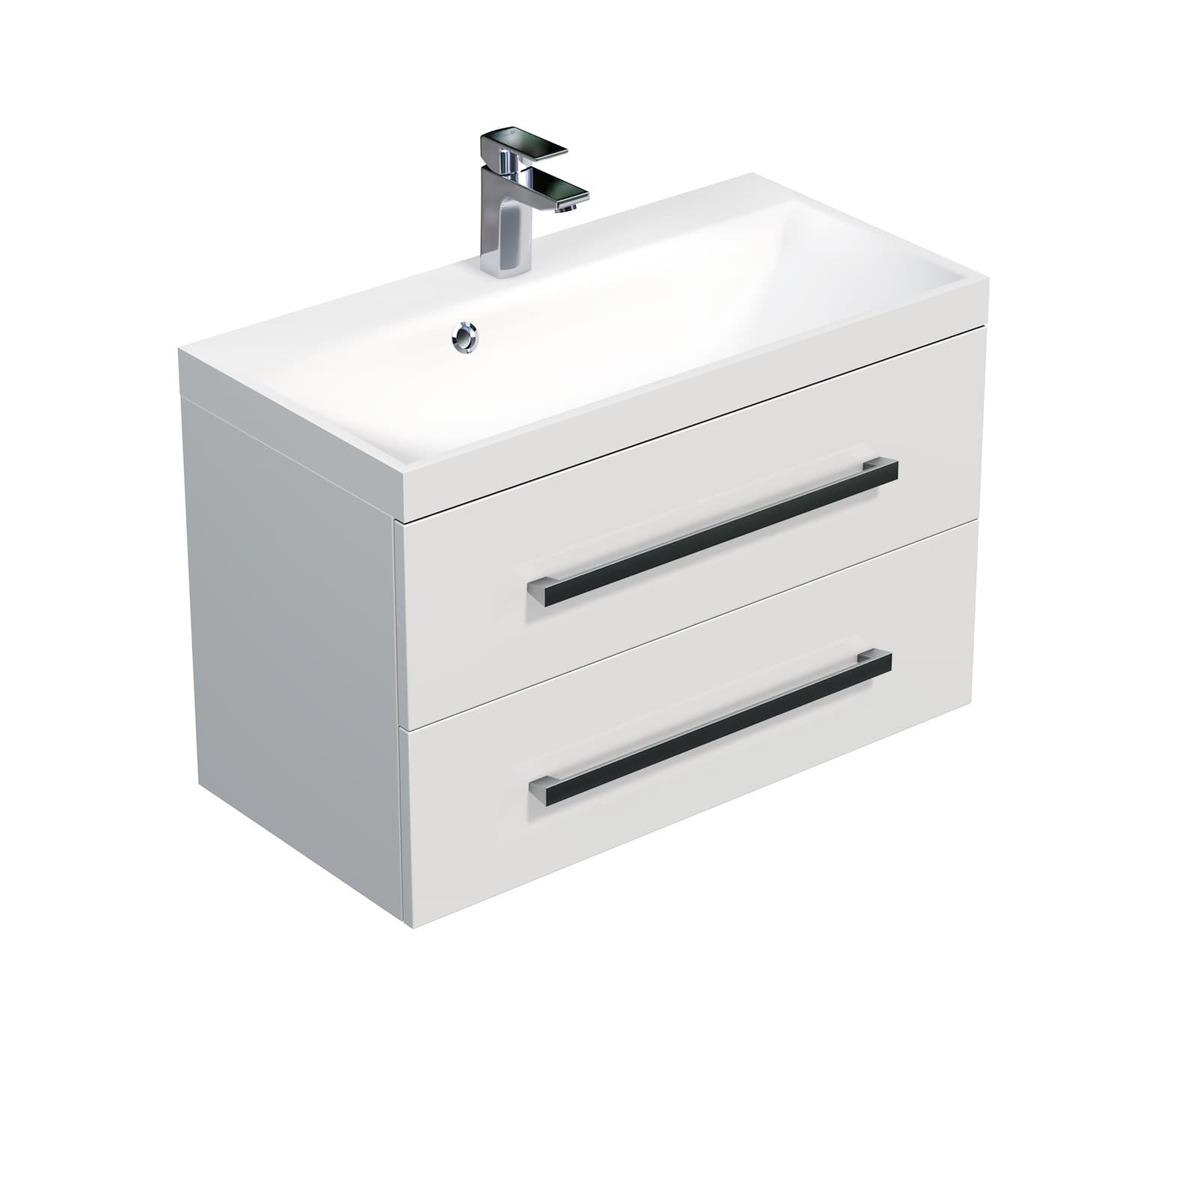 Koupelnová skříňka s umyvadlem Naturel Cube Way 80x40 cm bílá leskCUBE280ZBL